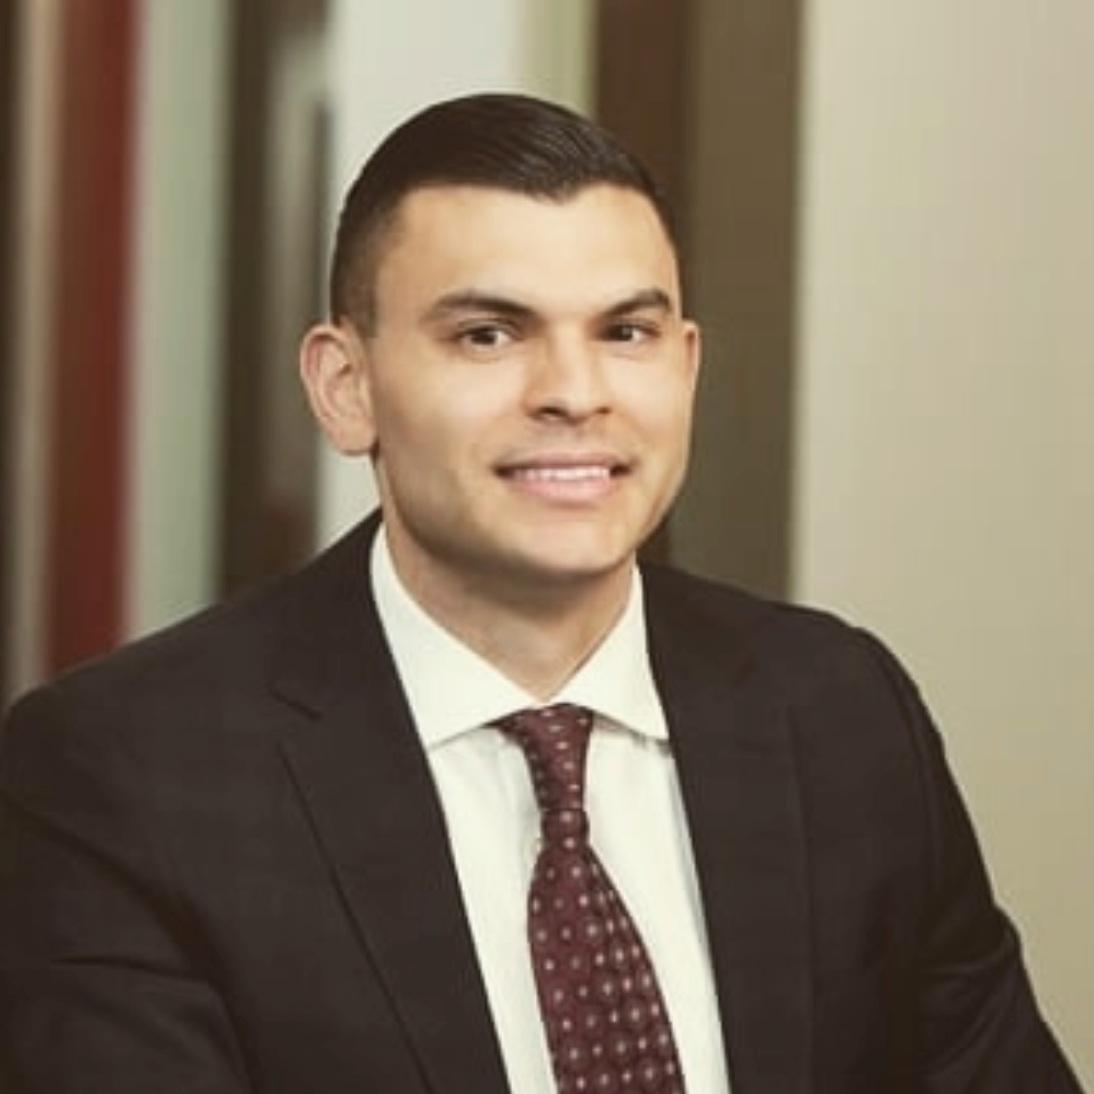 Keivan Roebuck - Attorney at Litchfield Cavo LLP